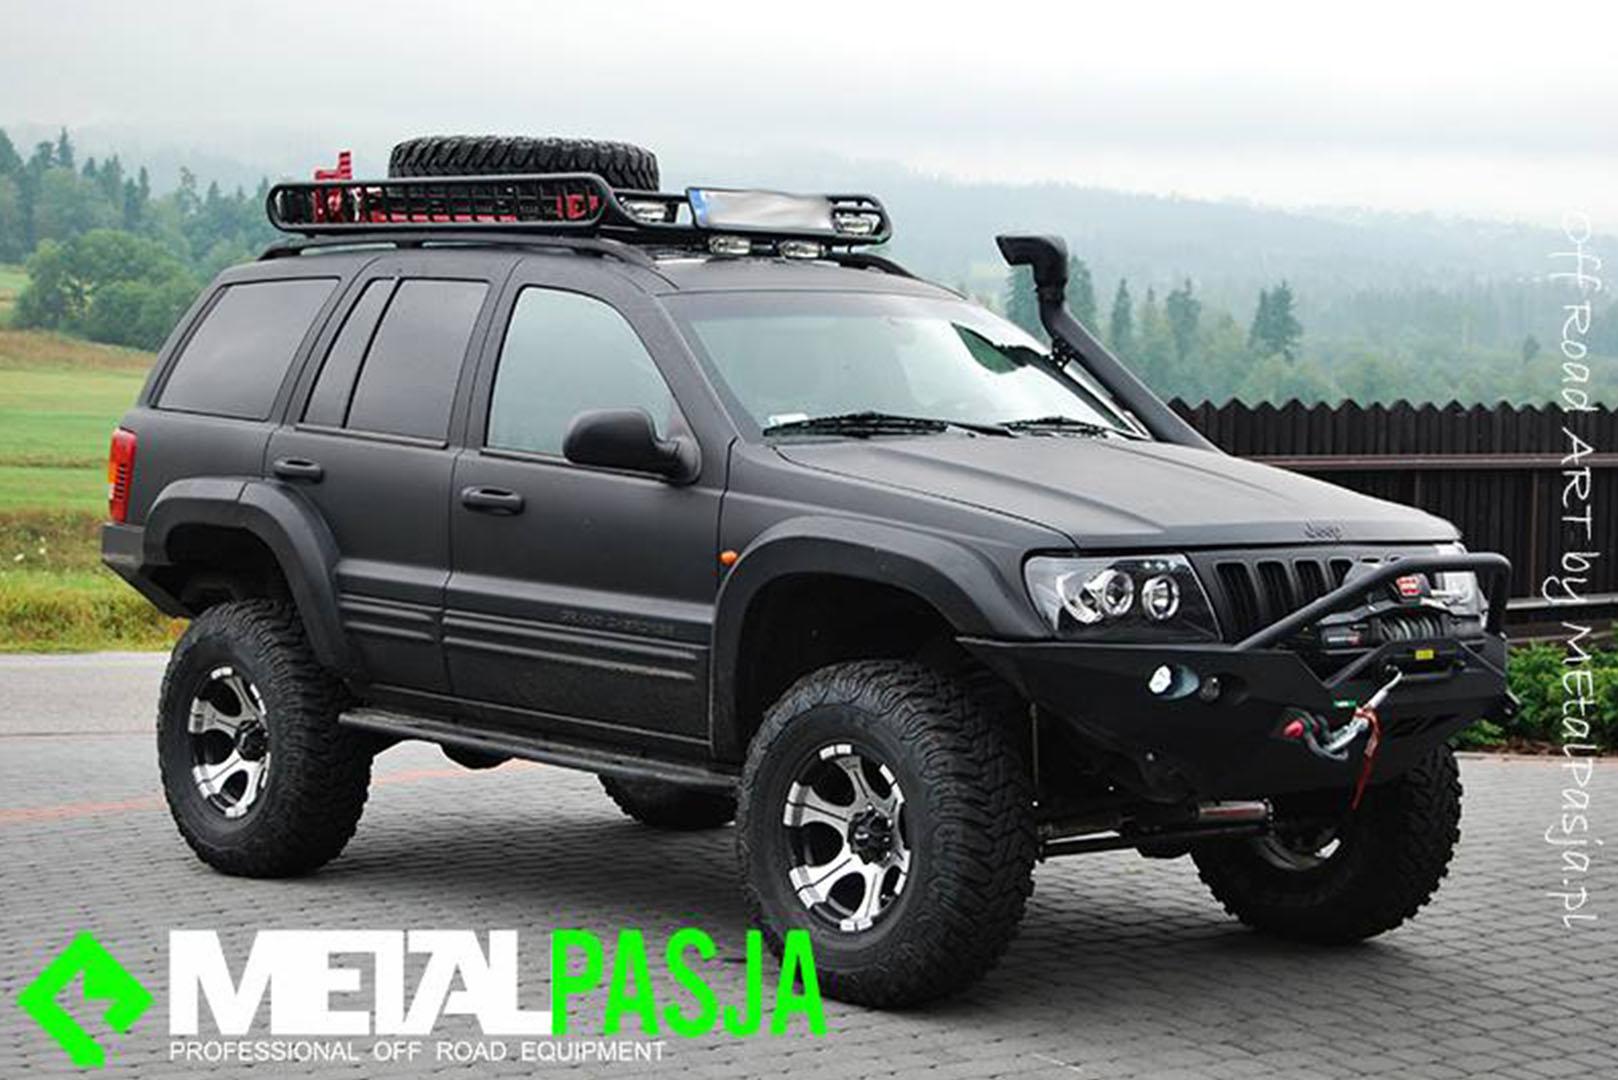 1_0013_Jeep-Grand-Cherokee-modyfikacje-off-road-1.jpg